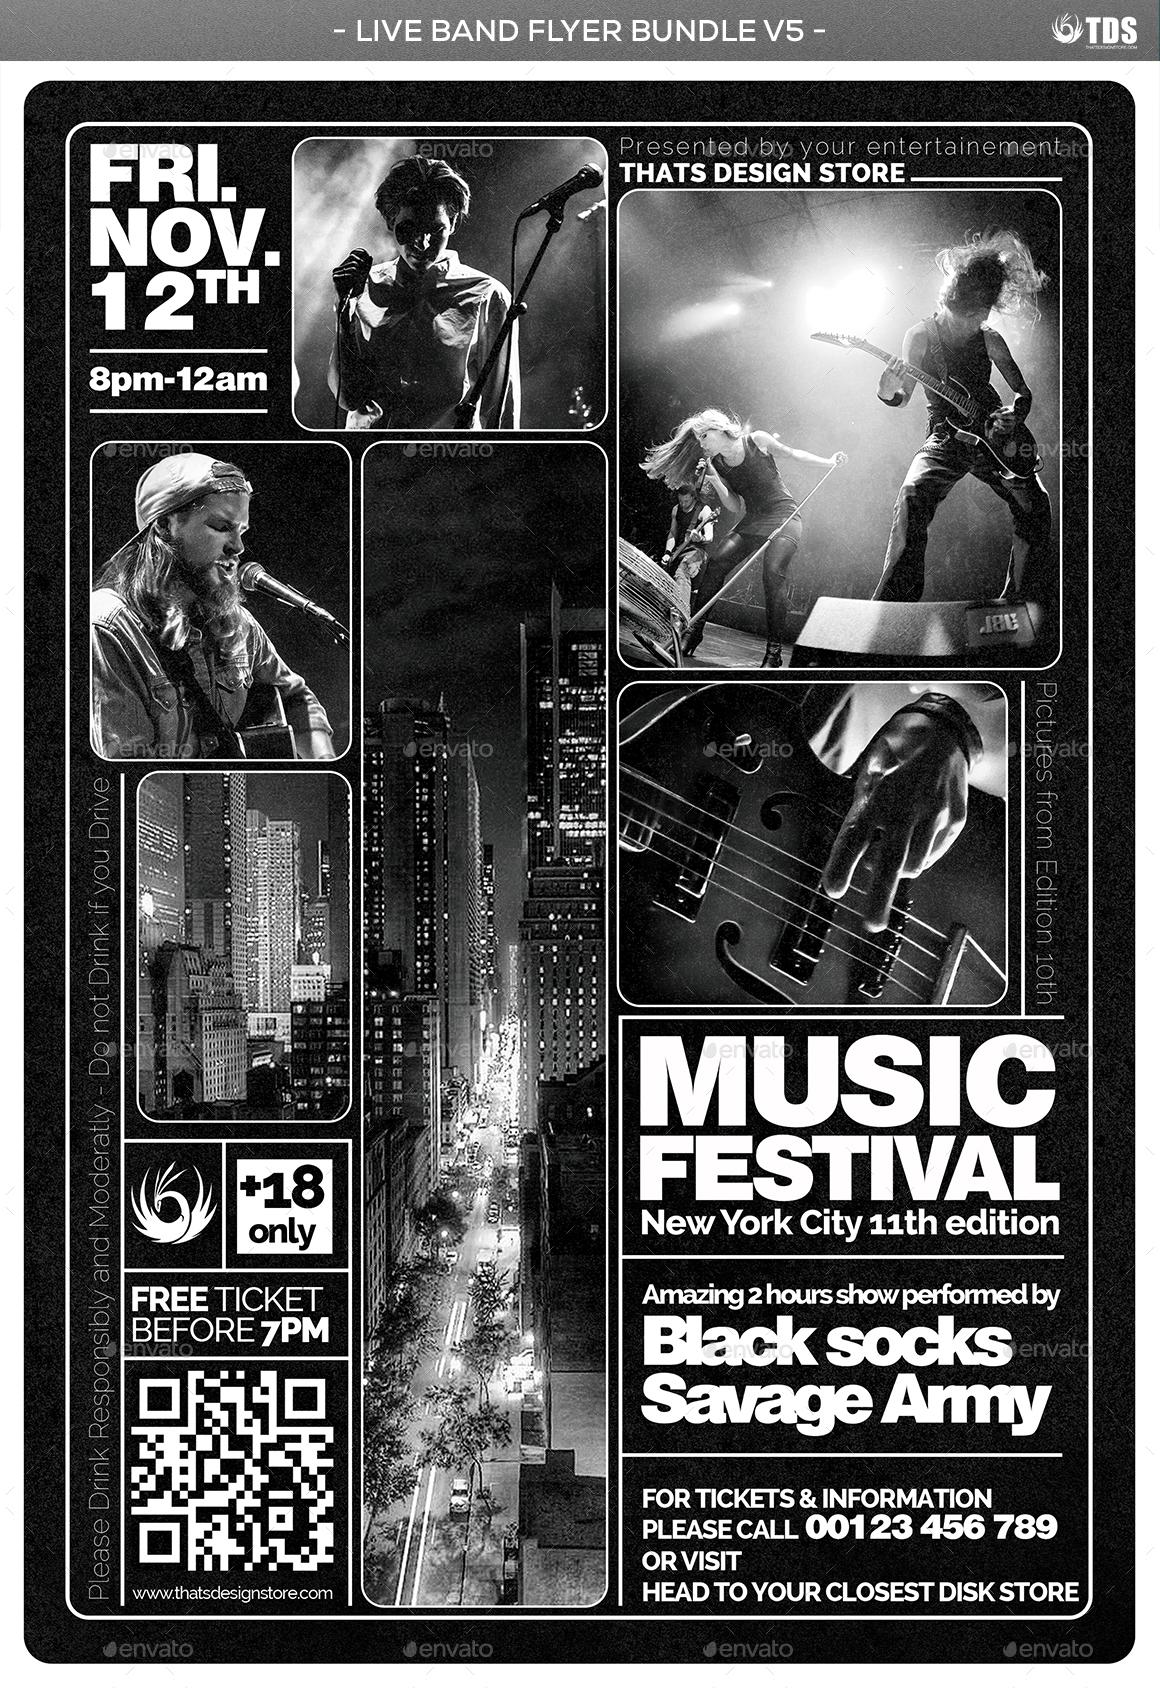 Live Band Flyer Bundle V5 by lou606 | GraphicRiver